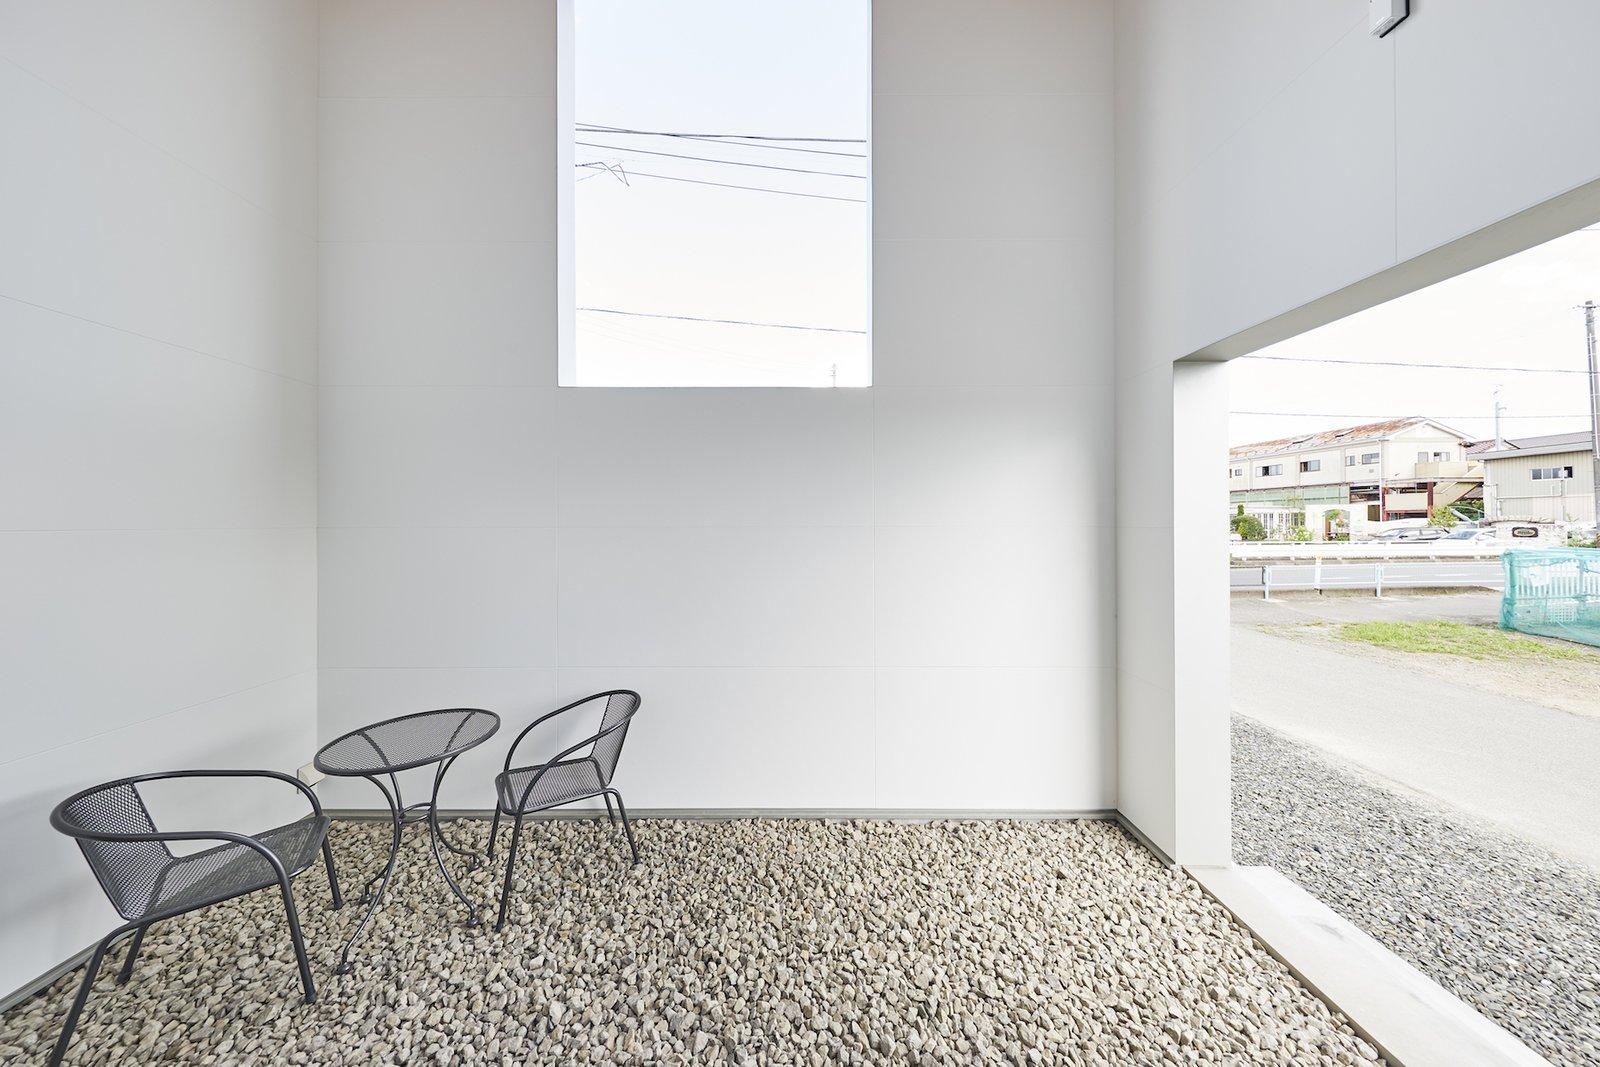 Photo 4 of 9 in House in Suwamachi by Kazuya Saito Architects